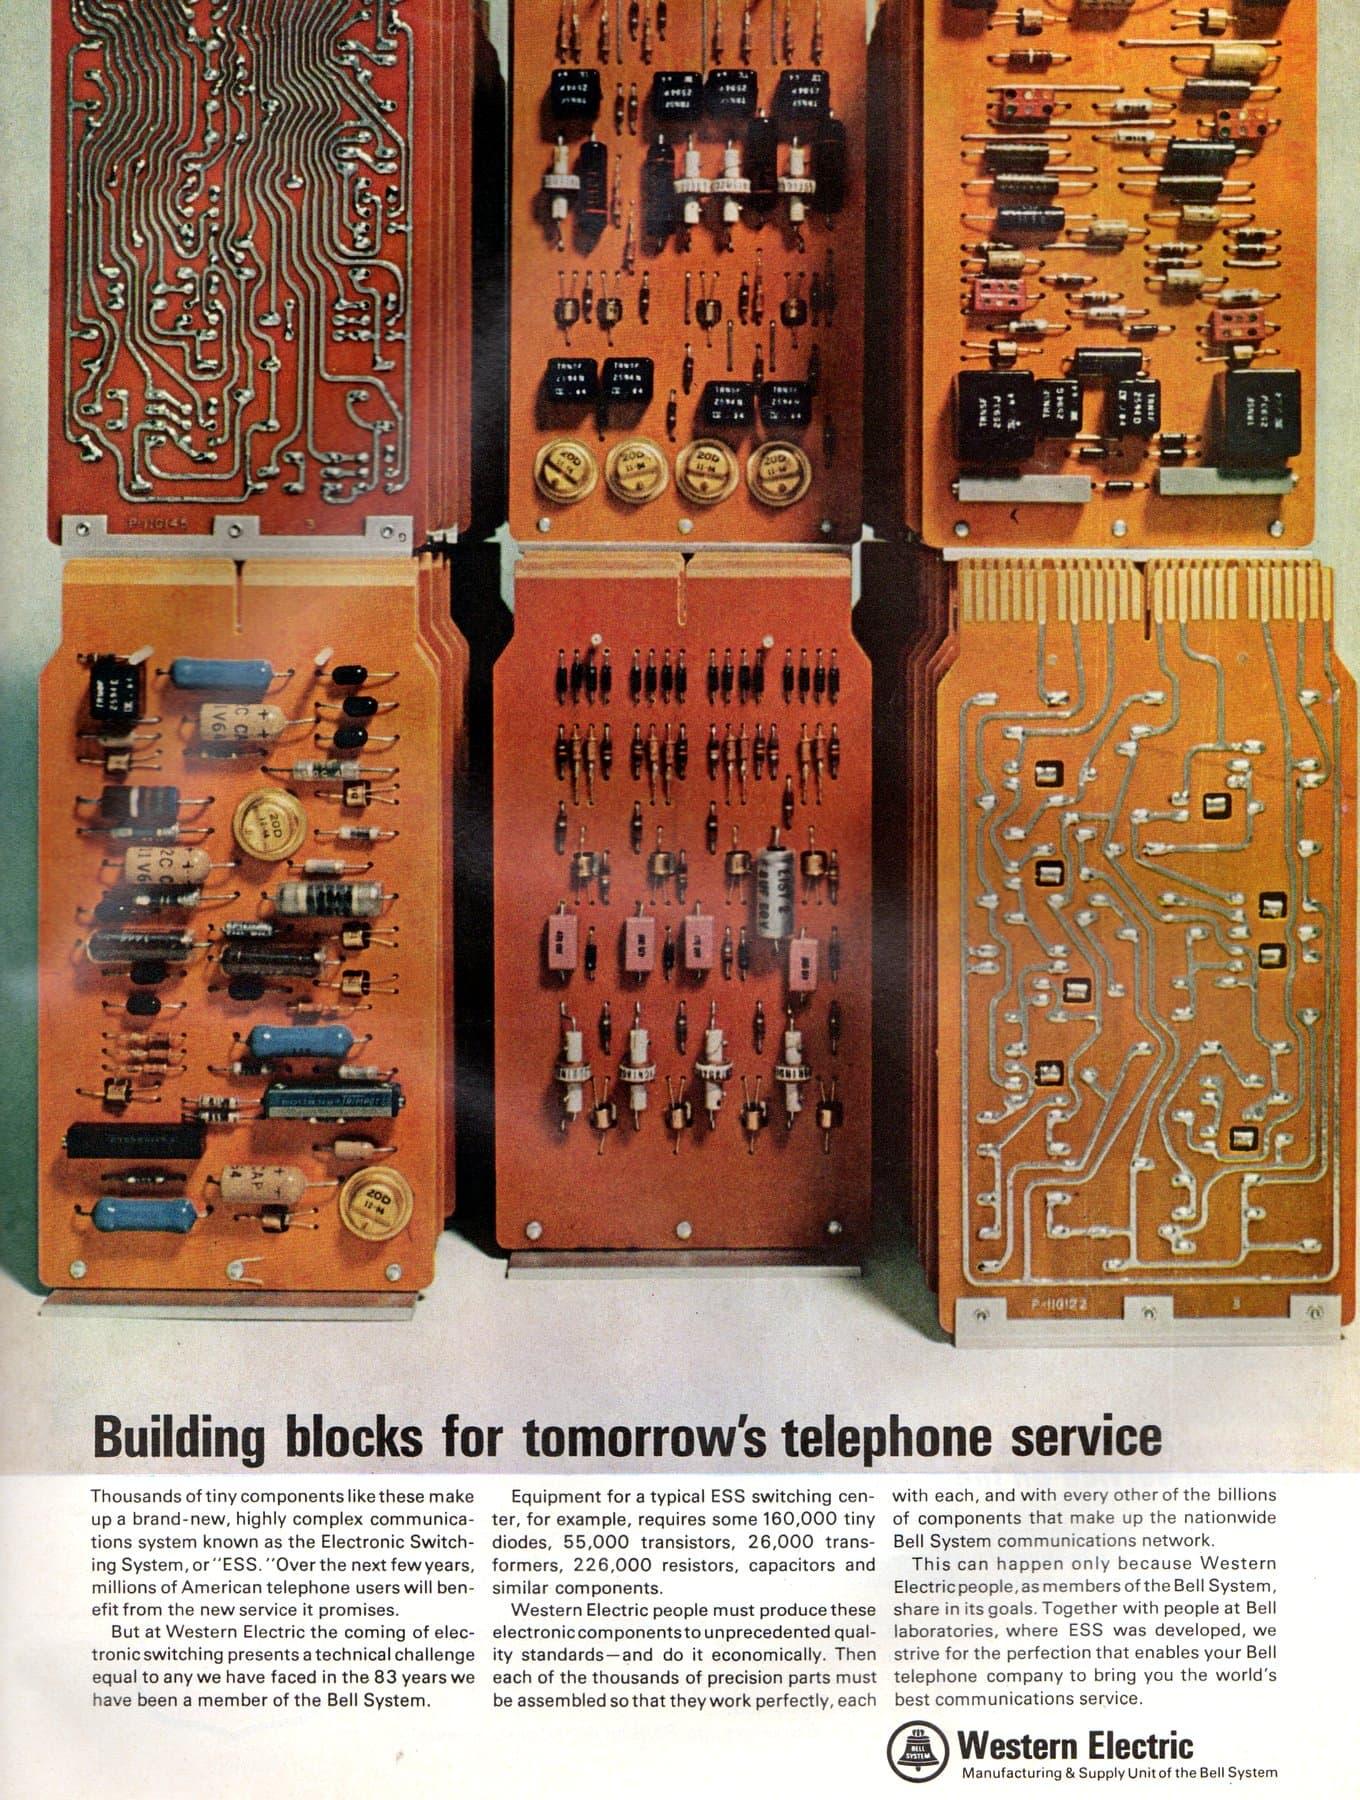 Retro computer components Building blocks for tomorrow's telephone service (1965)